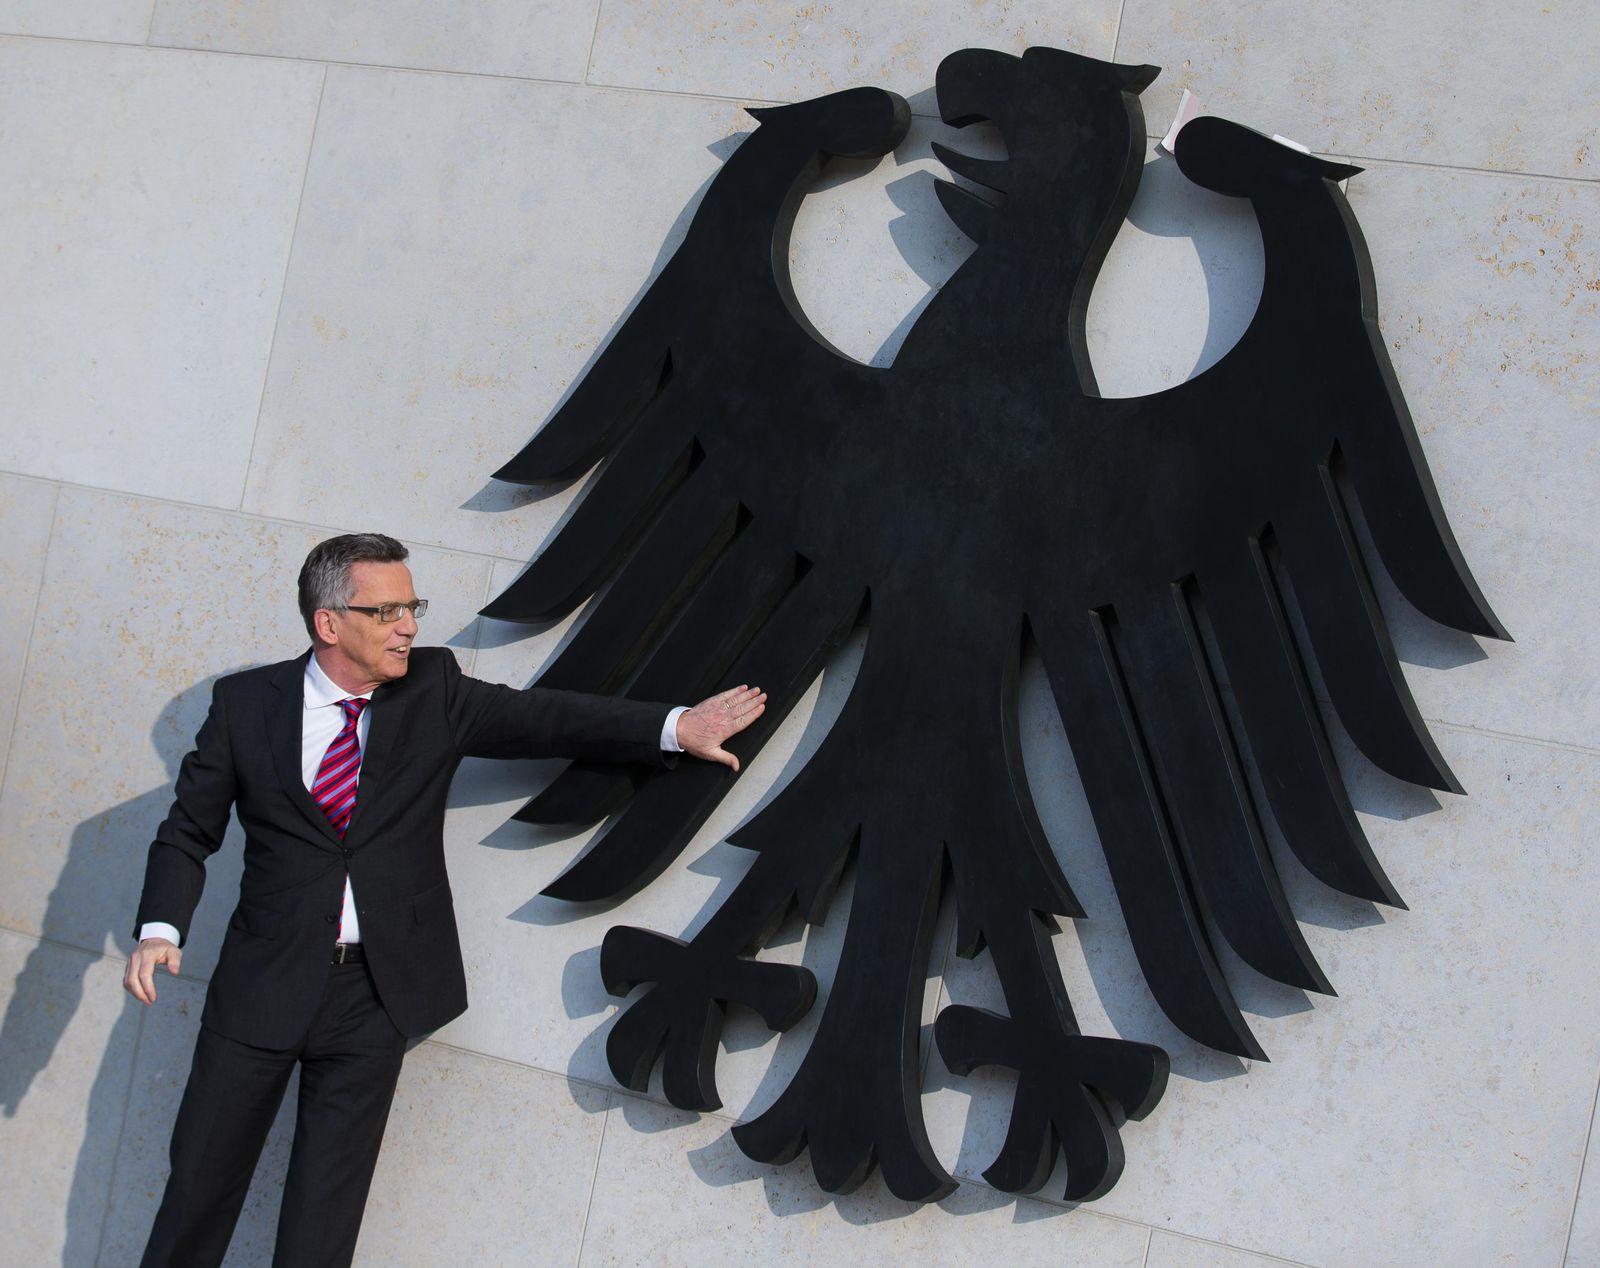 GERMANY-POLITCS/